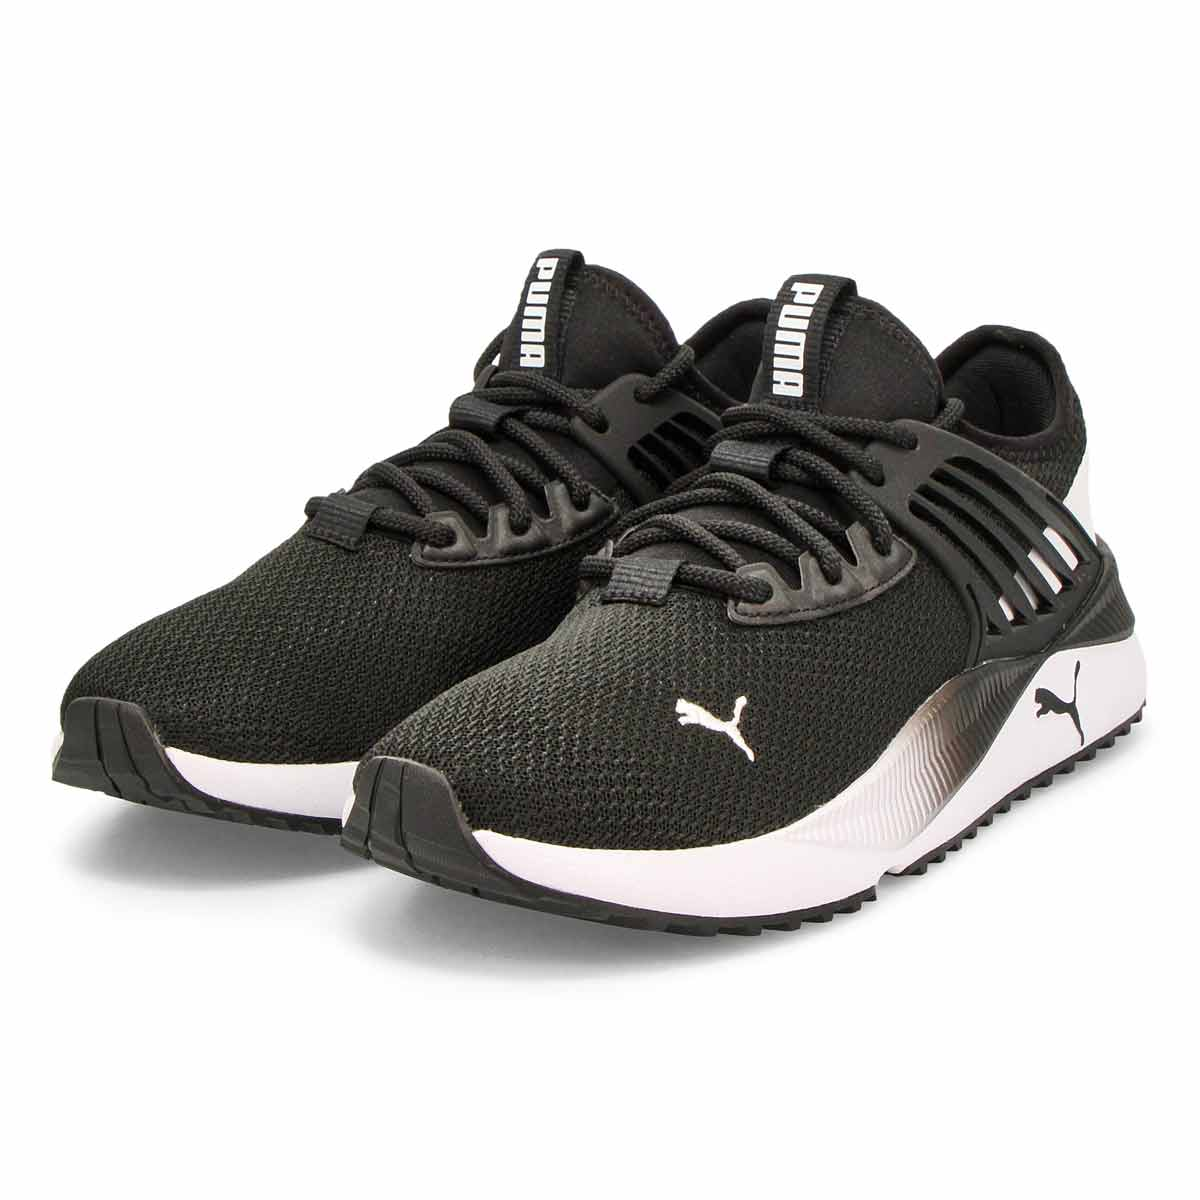 Men's Pacer Future Classic Sneaker - Black/White